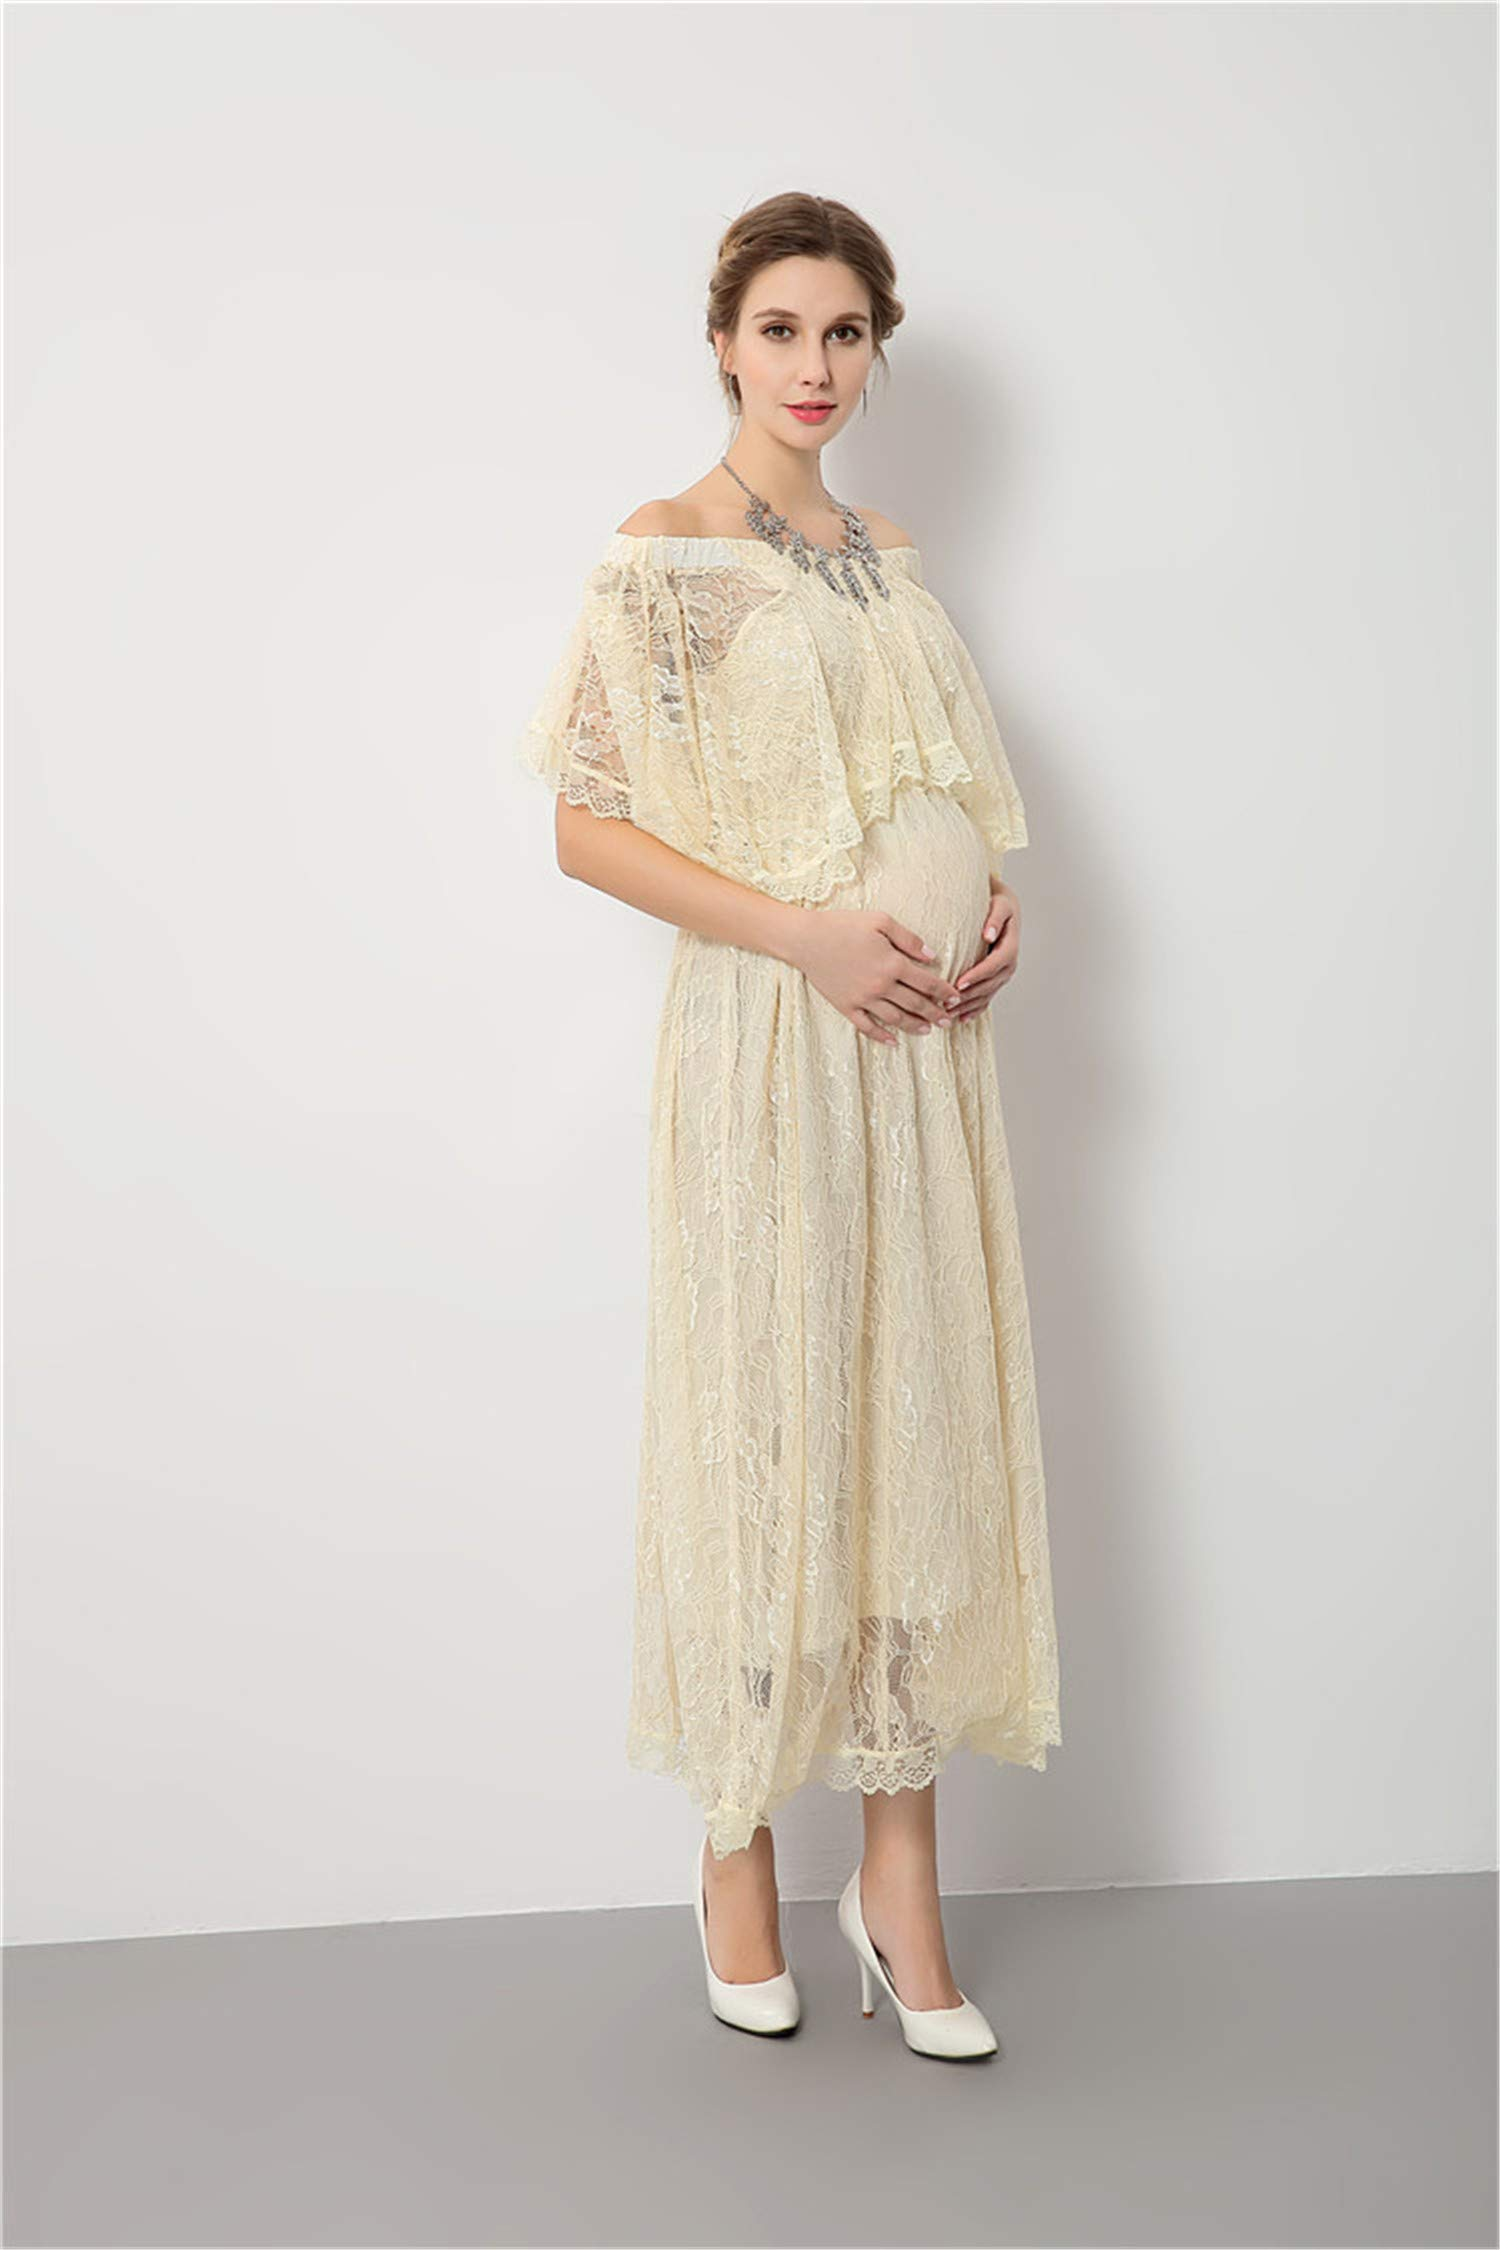 UNIQUE-F Maternity Skirt Photography Props Pregnant Women Dress Split Front Photo Word Shoulder Elegant Charming Loose Comfort